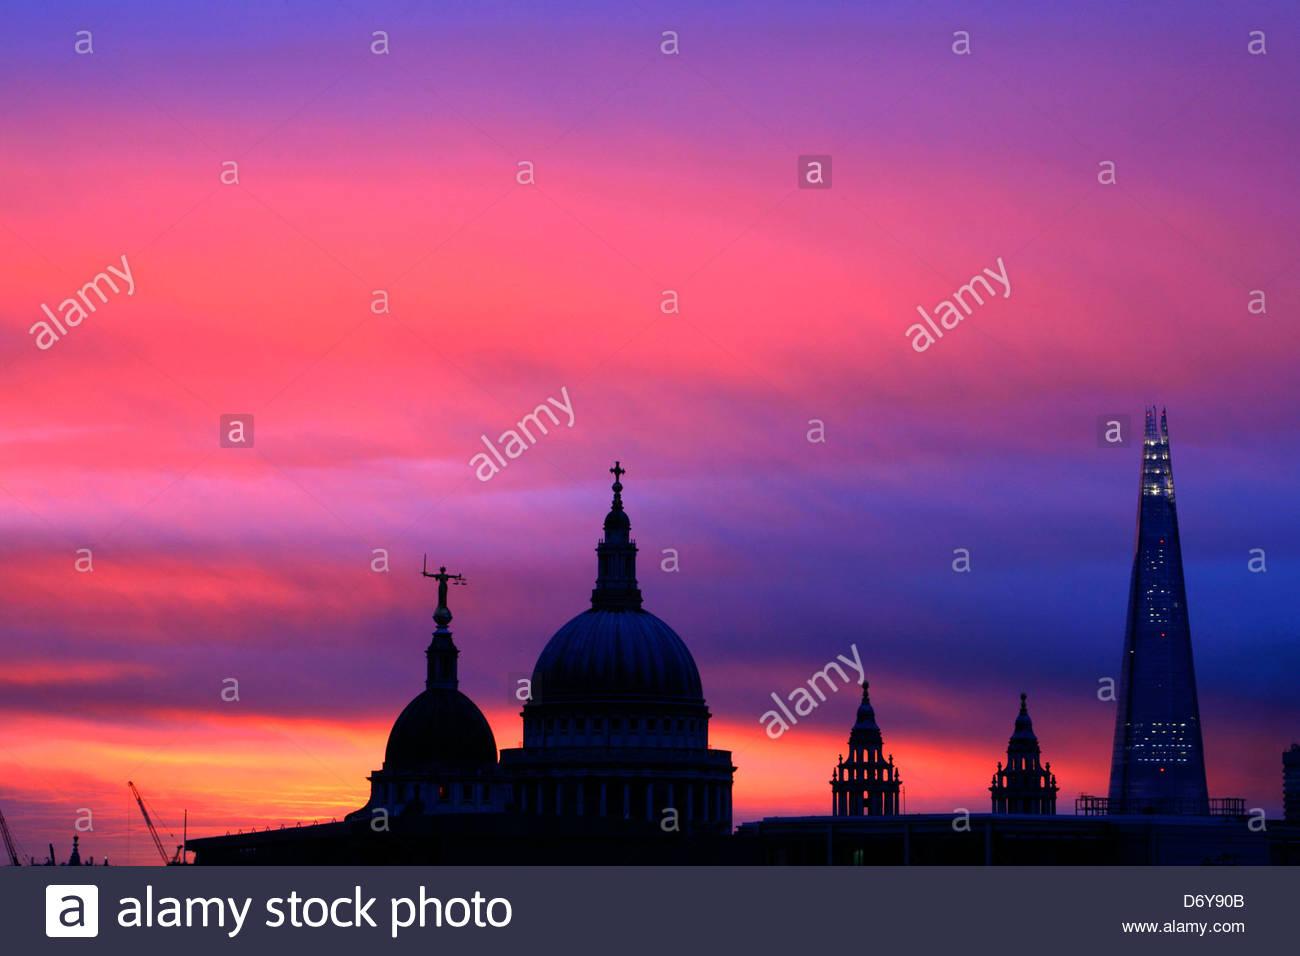 Skyline-Blick bei Sonnenaufgang des Old Bailey, St. Pauls Cathedral und der Shard, City of London, UK Stockbild